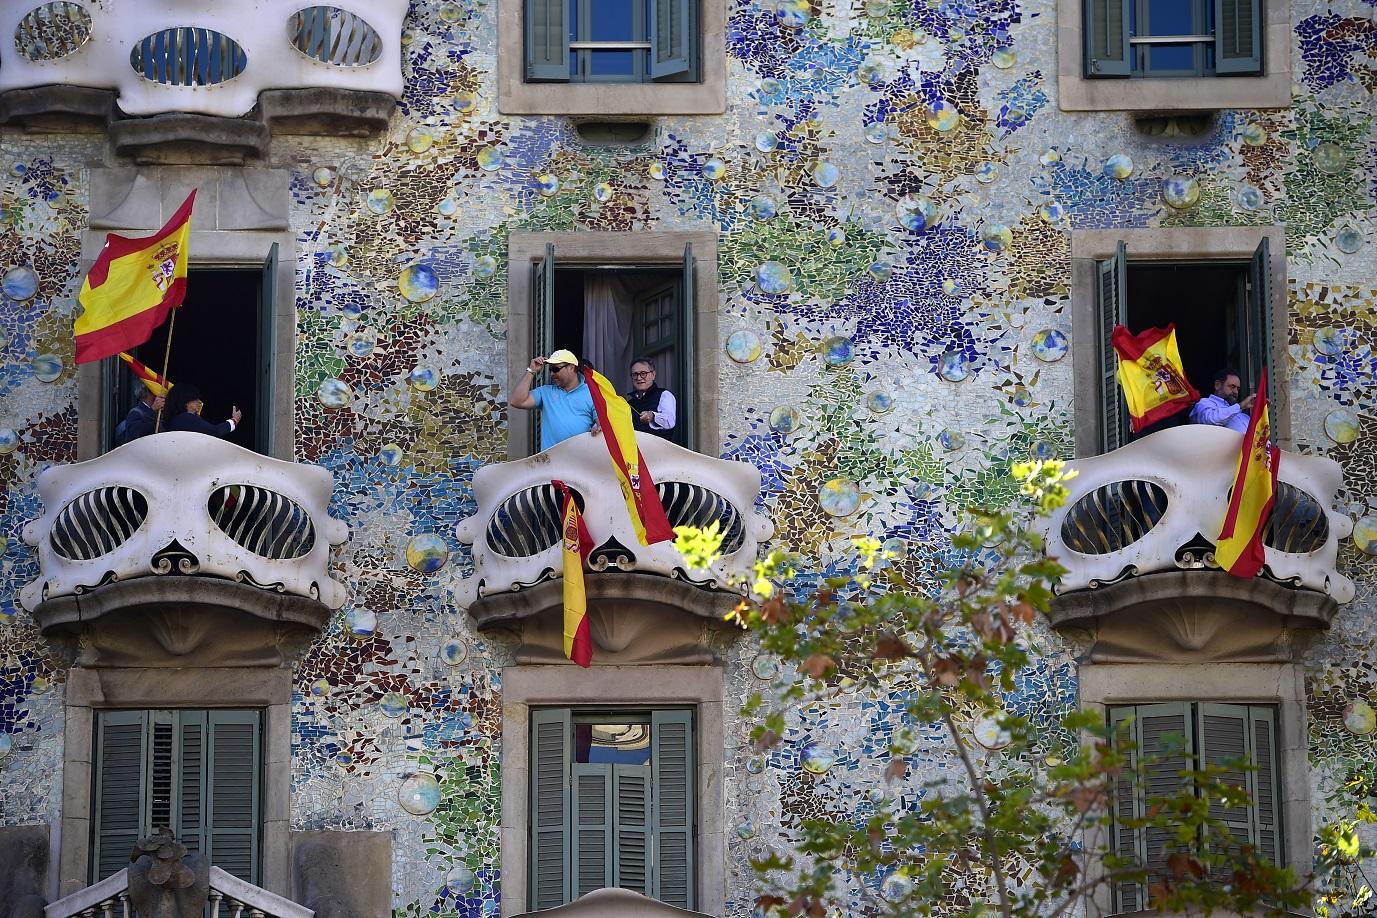 A famosa Casa Batlló, de Gaudi, também virou palco da disputa entre nacionalistas e separatistas. Foto Pierre-Philippe Marcou